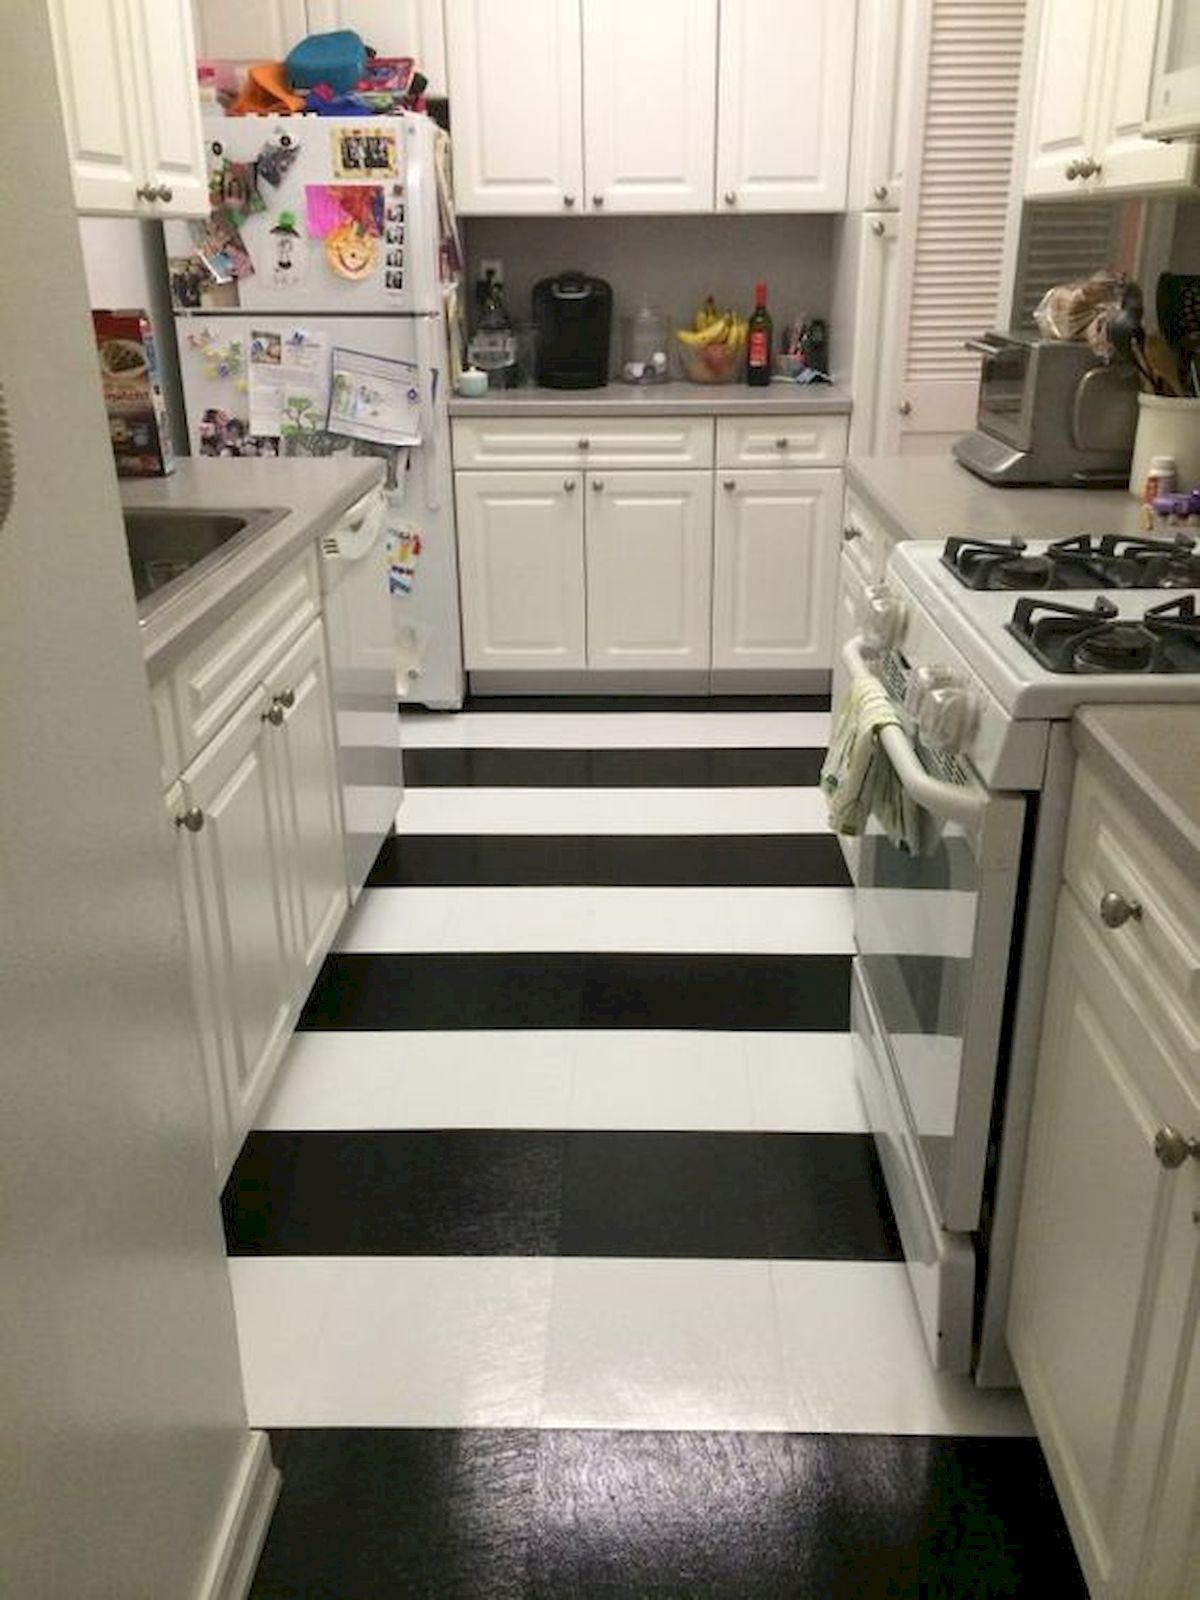 40 Best Tile Flooring Designs Ideas For Modern Kitchen (19)